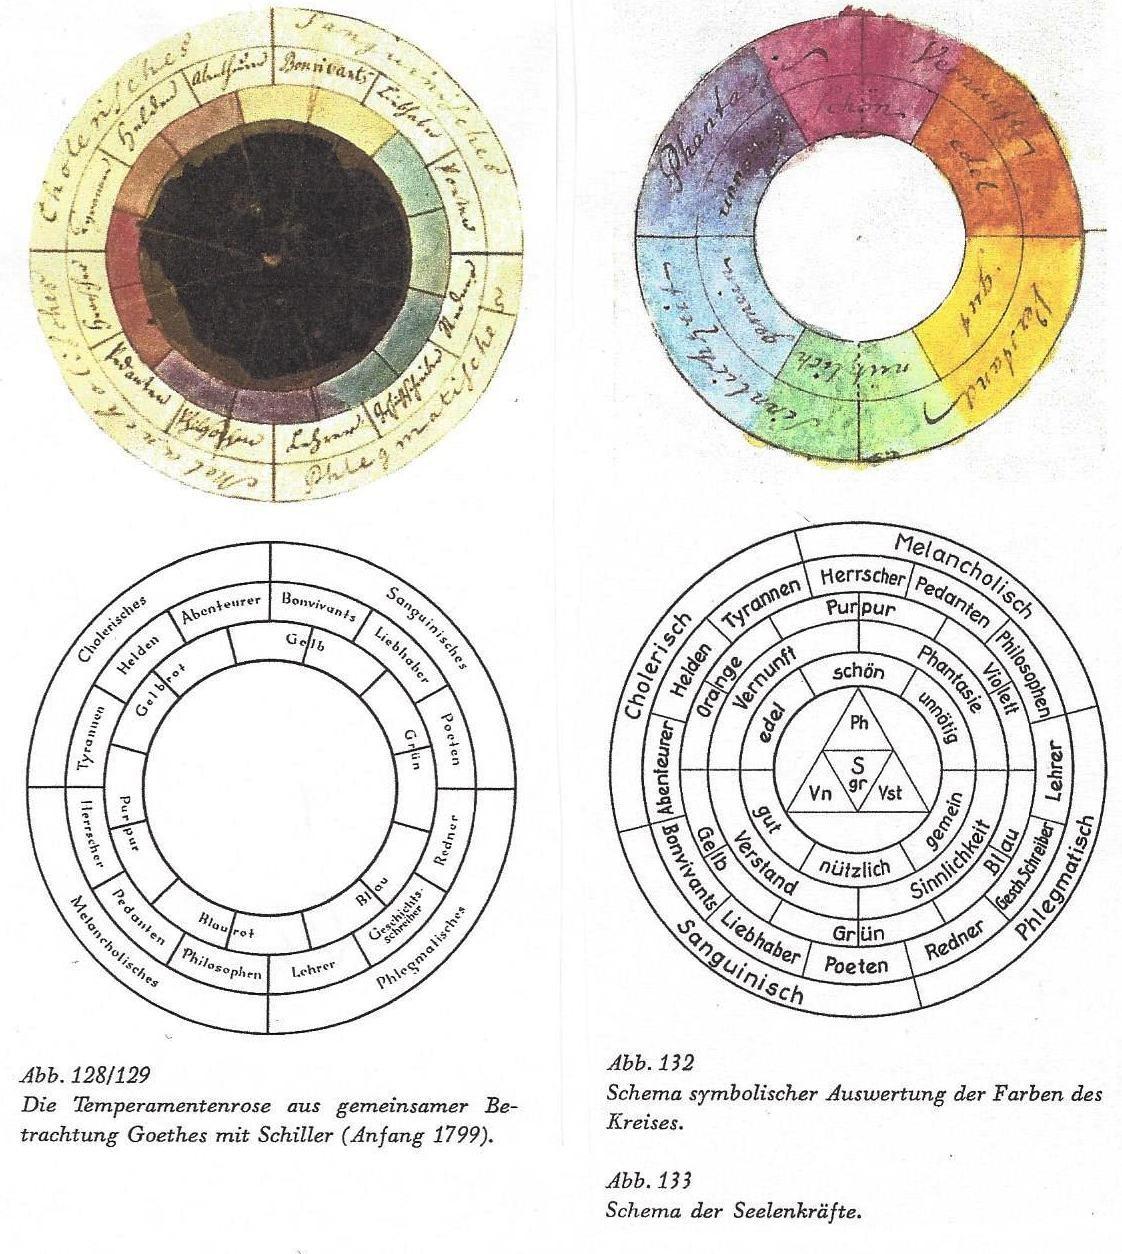 Urmuster eines Farbpsychogramms